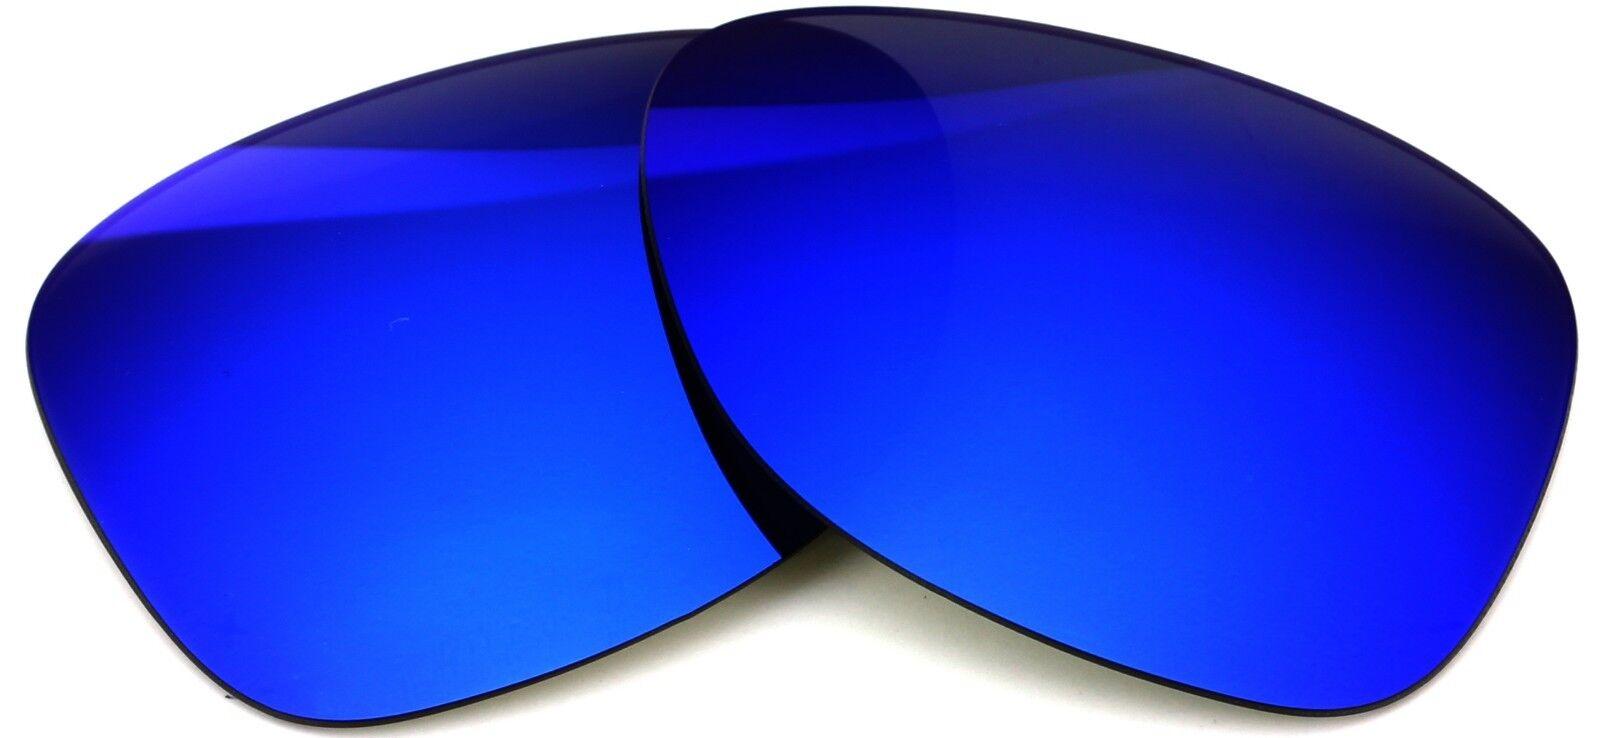 584edaef40 Polarized Ikon Replacement Lenses for Ray Ban BOYFRIEND Rb4147 60mm ...